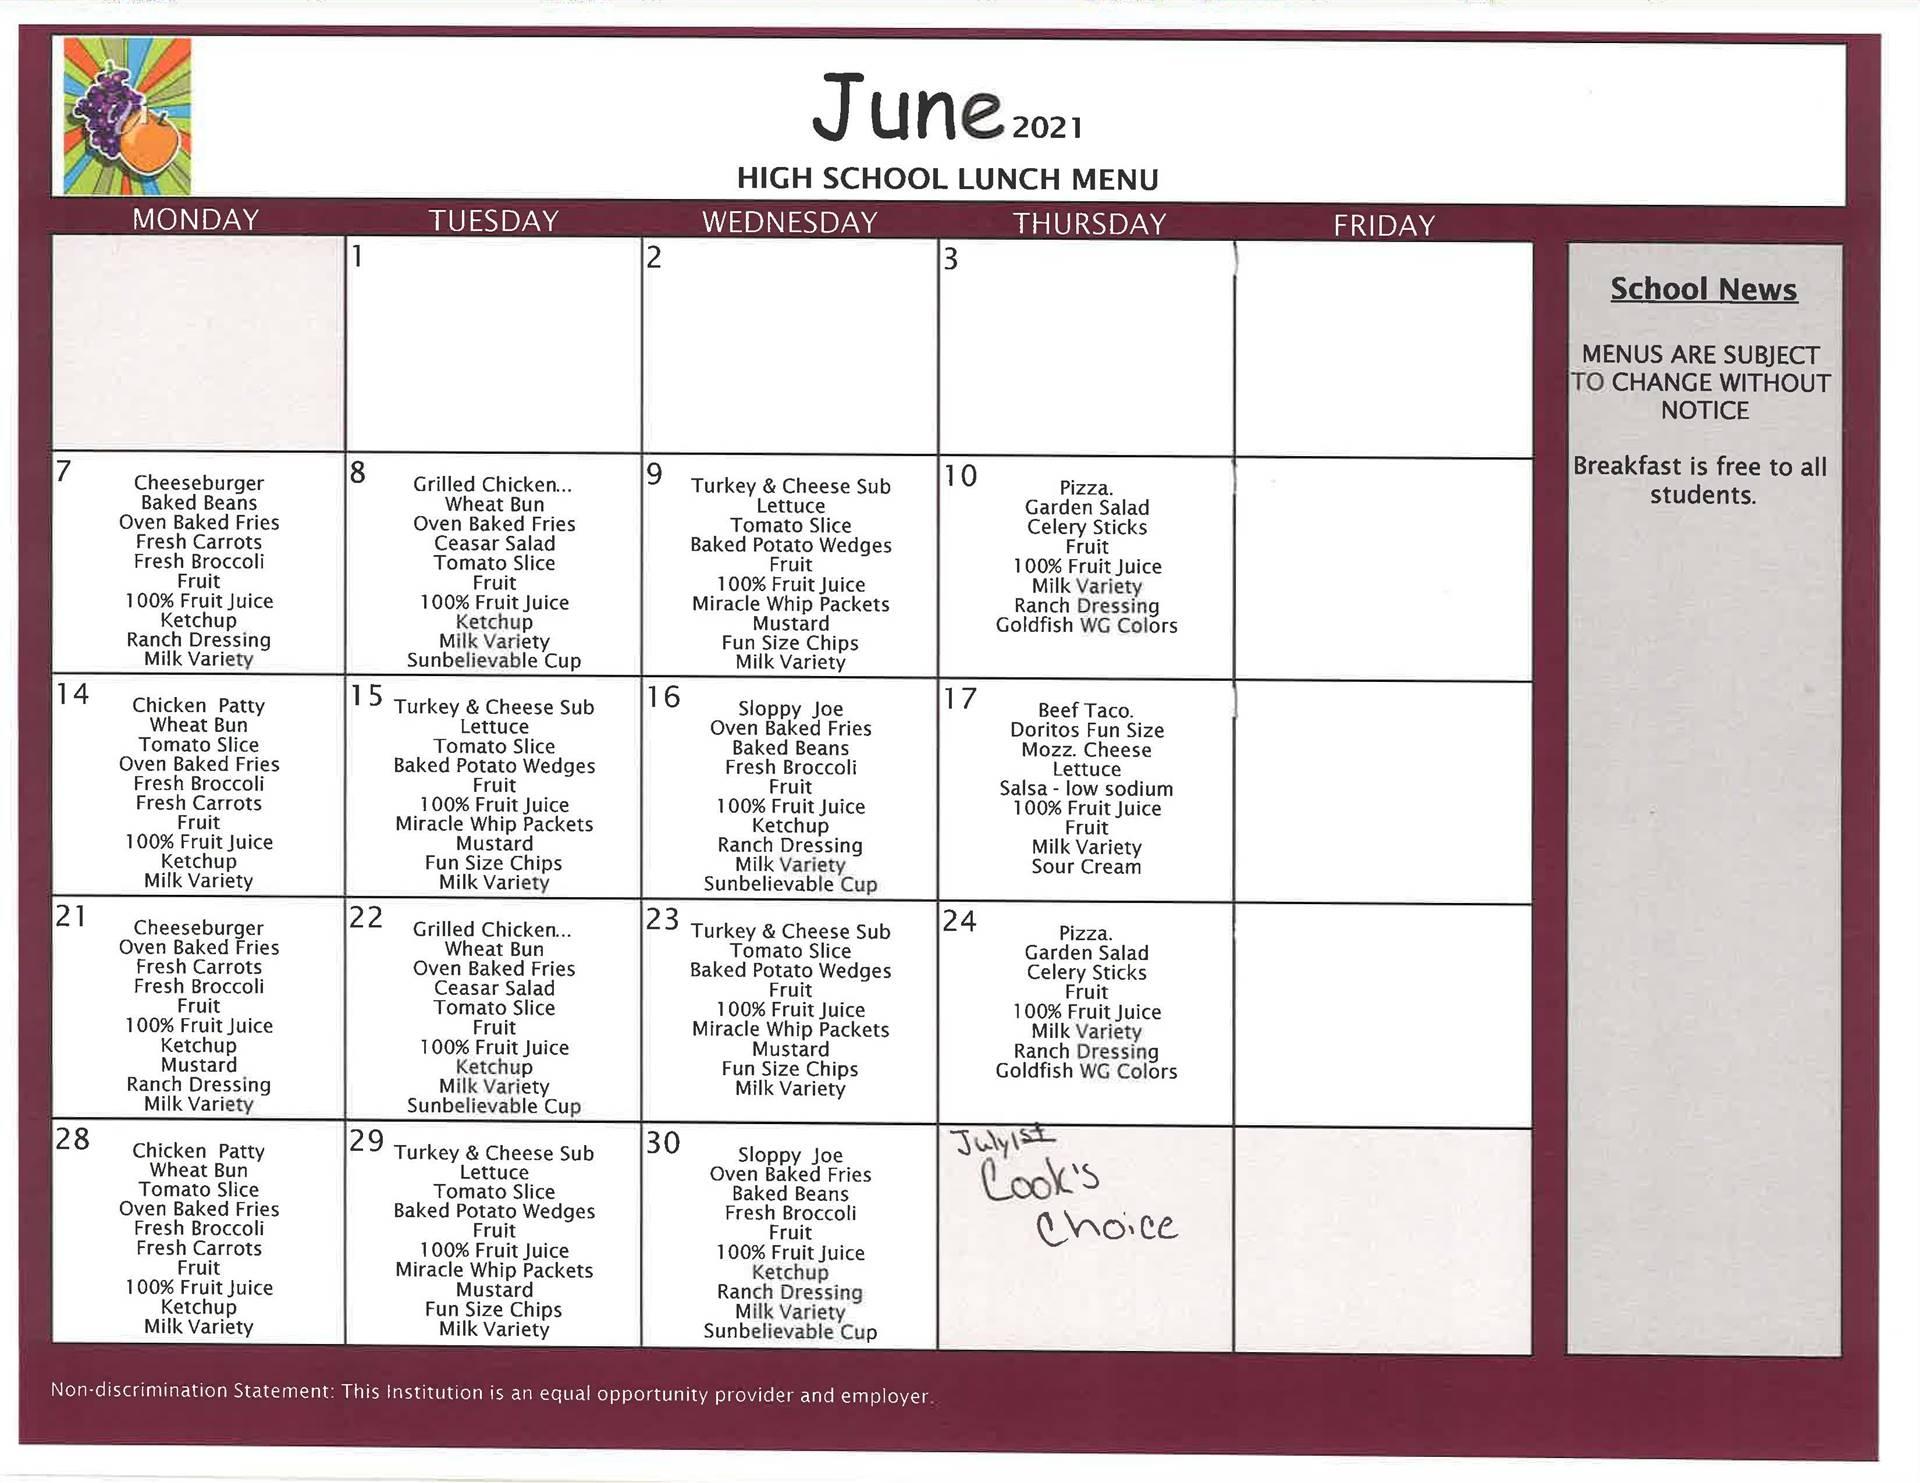 June High School Lunch - Summer School/Summer Feeding Program